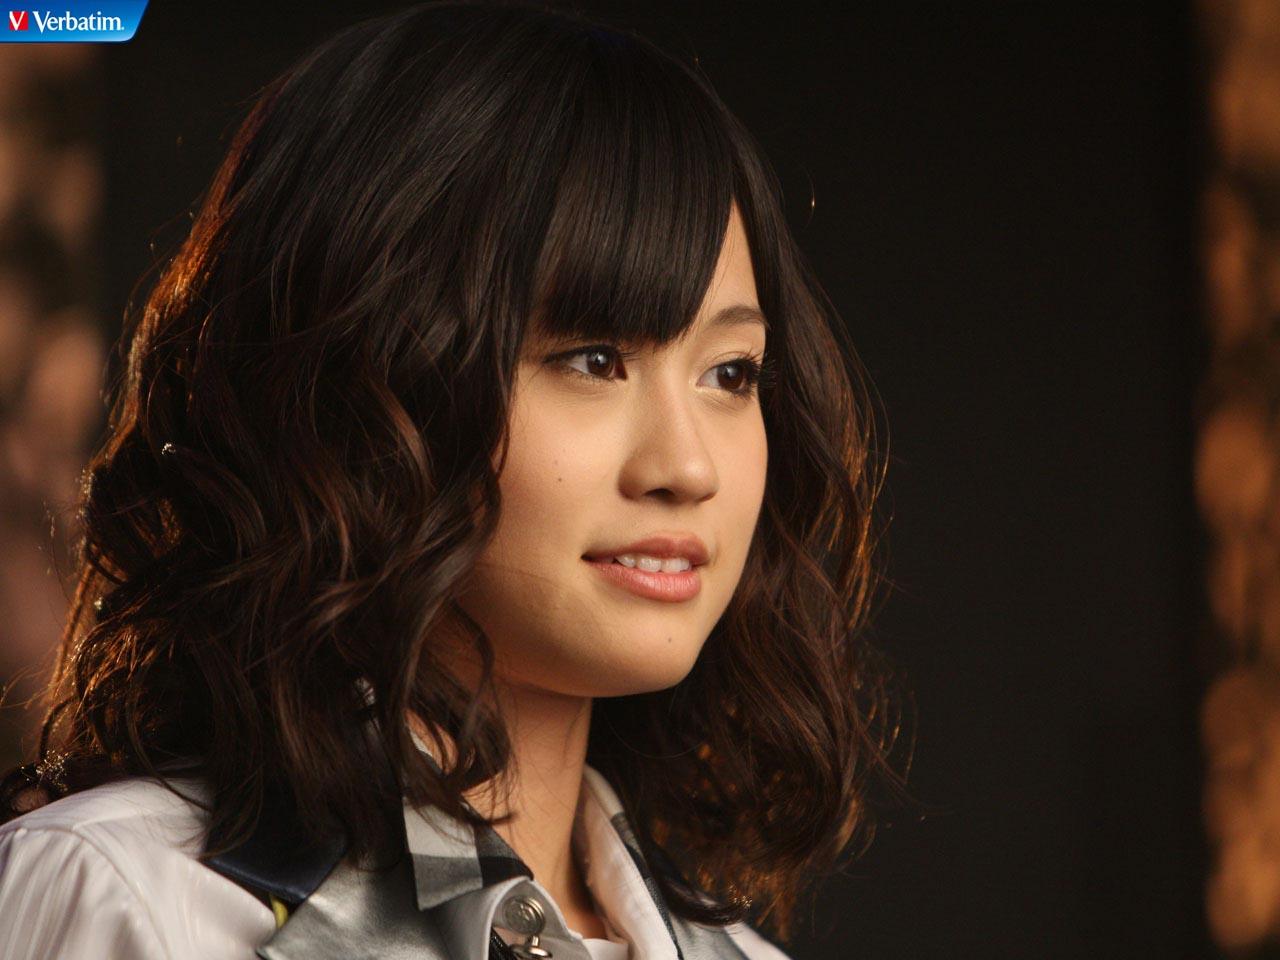 Maeda Atsuko - AKB48 Wallpaper (38455604) - Fanpop